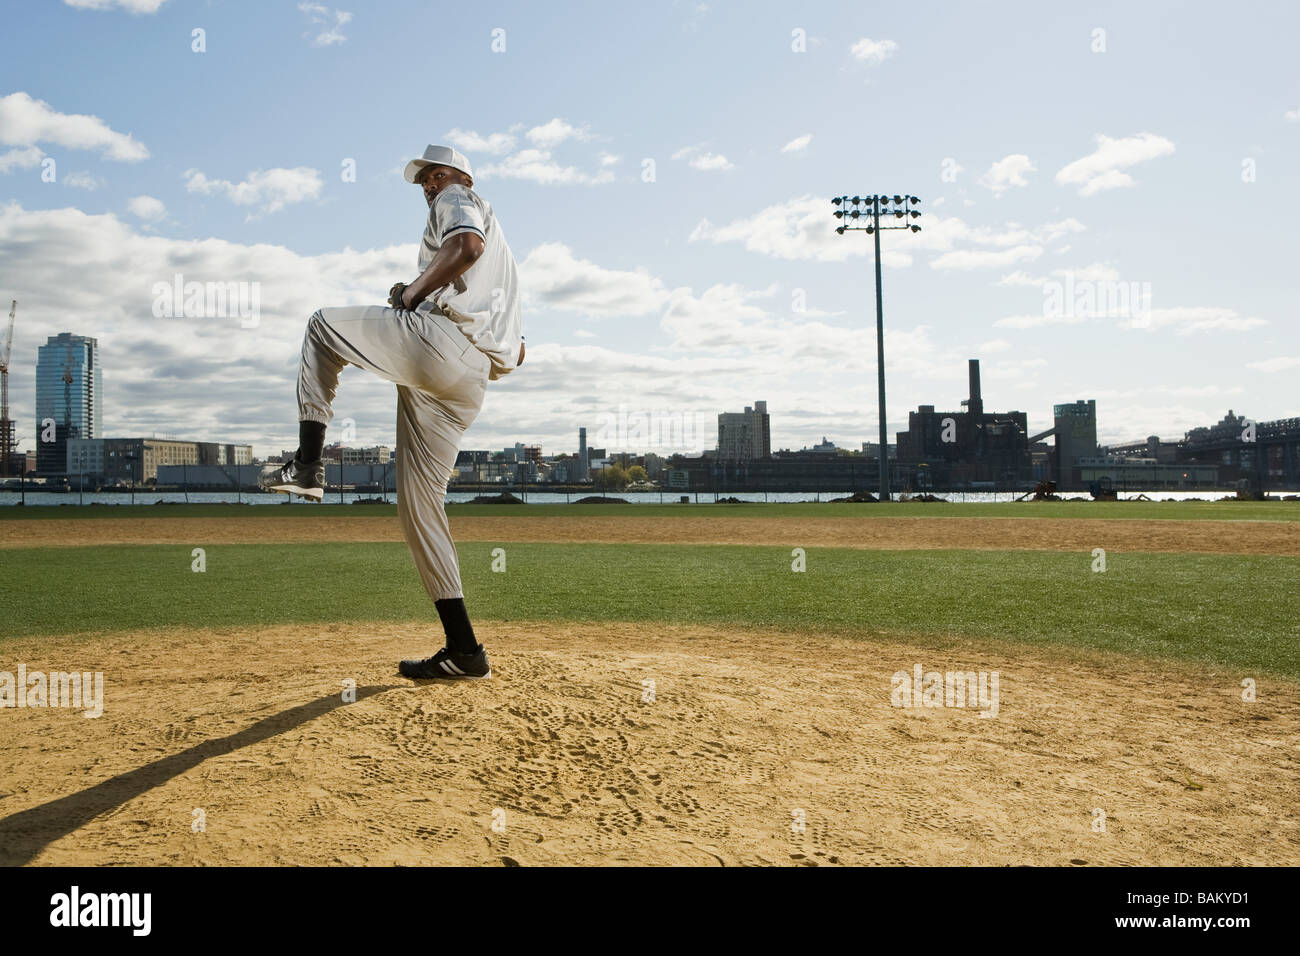 Baseball pitcher standing on one leg - Stock Image